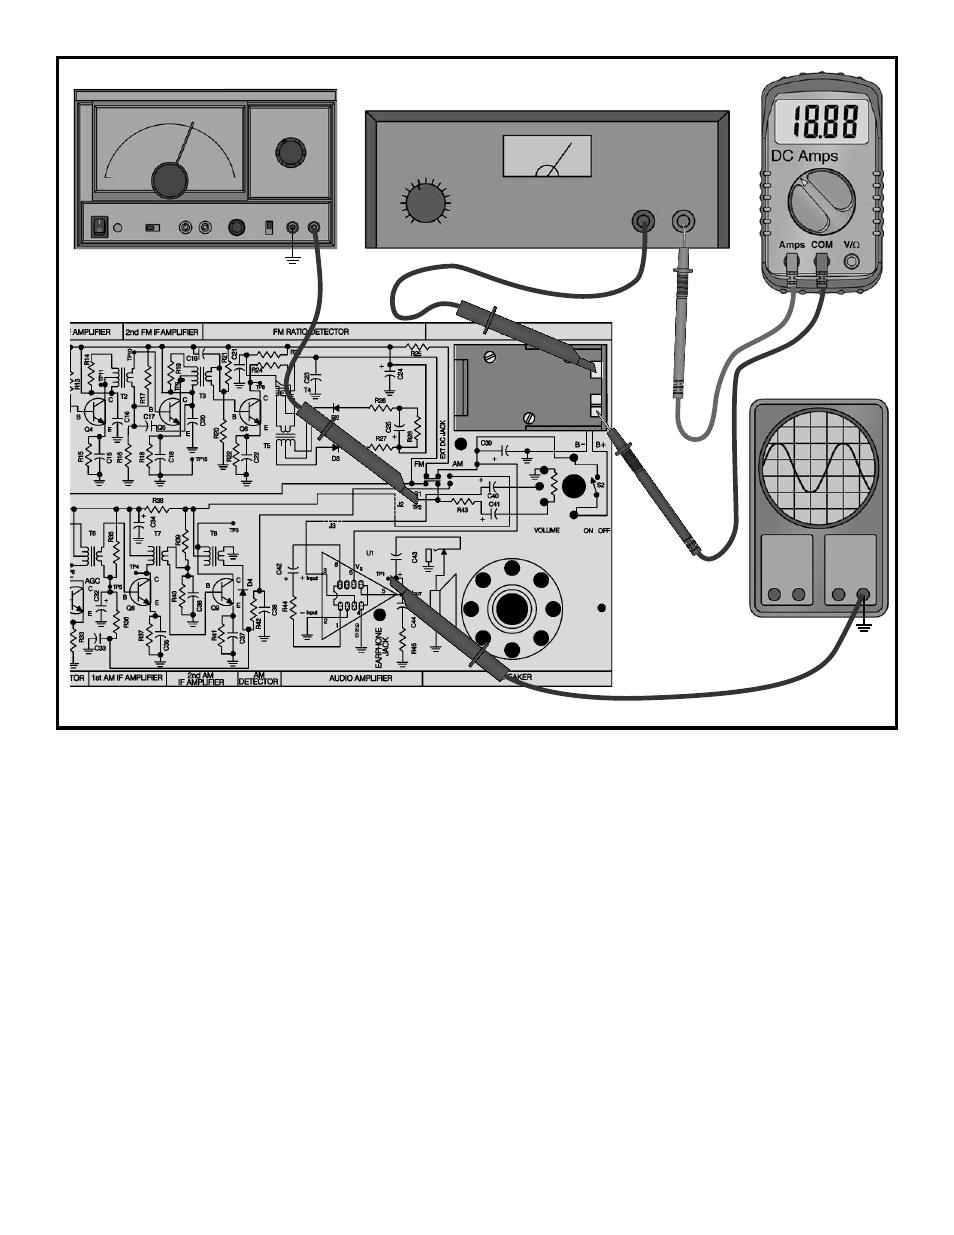 Elenco AM/FM Radio Kit User Manual | Page 15 / 64